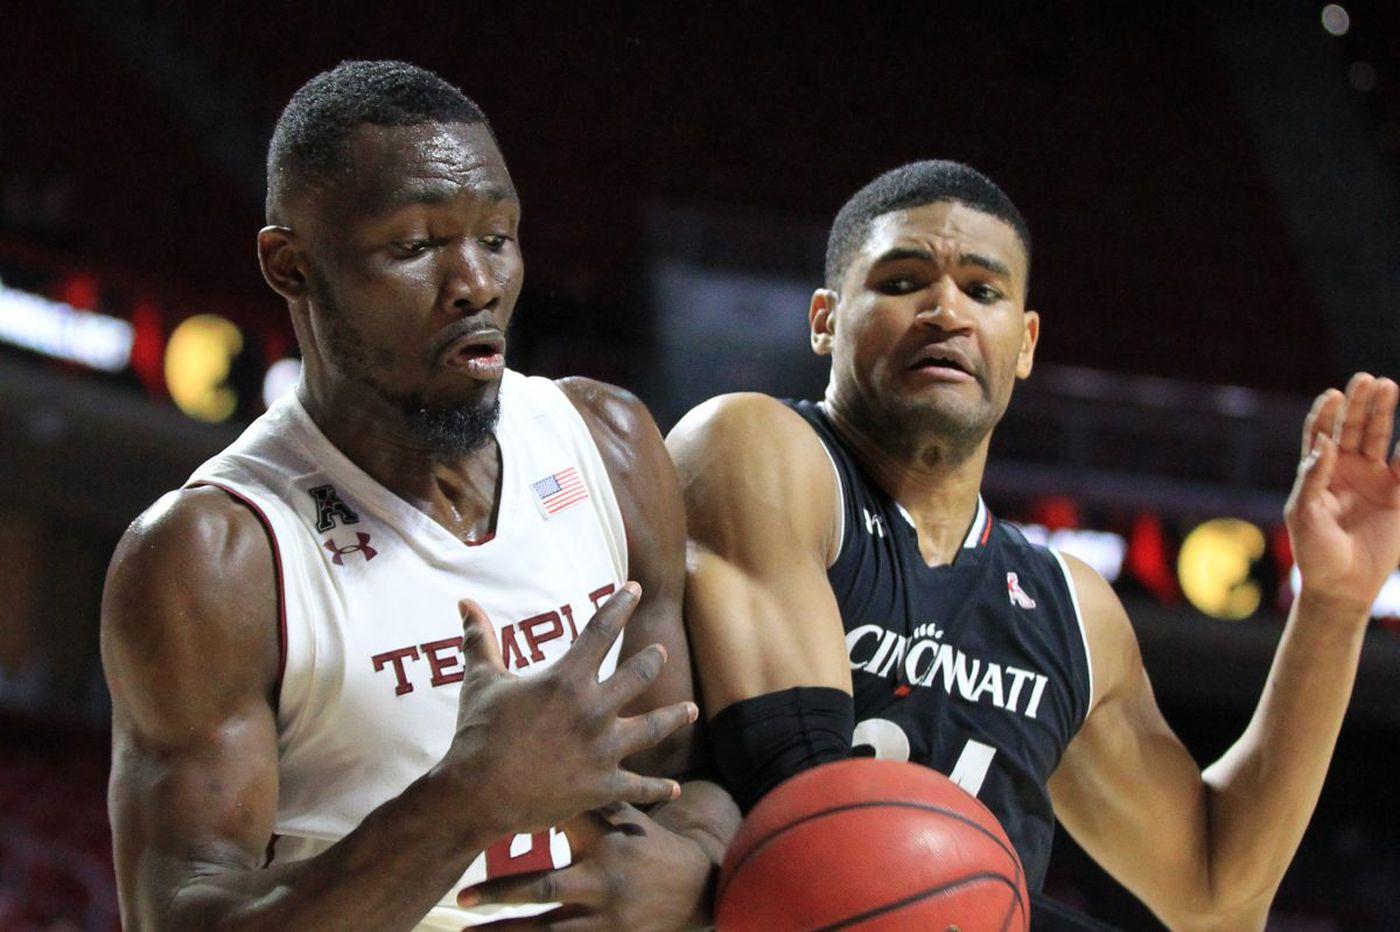 Sunday's City Six basketball game previews